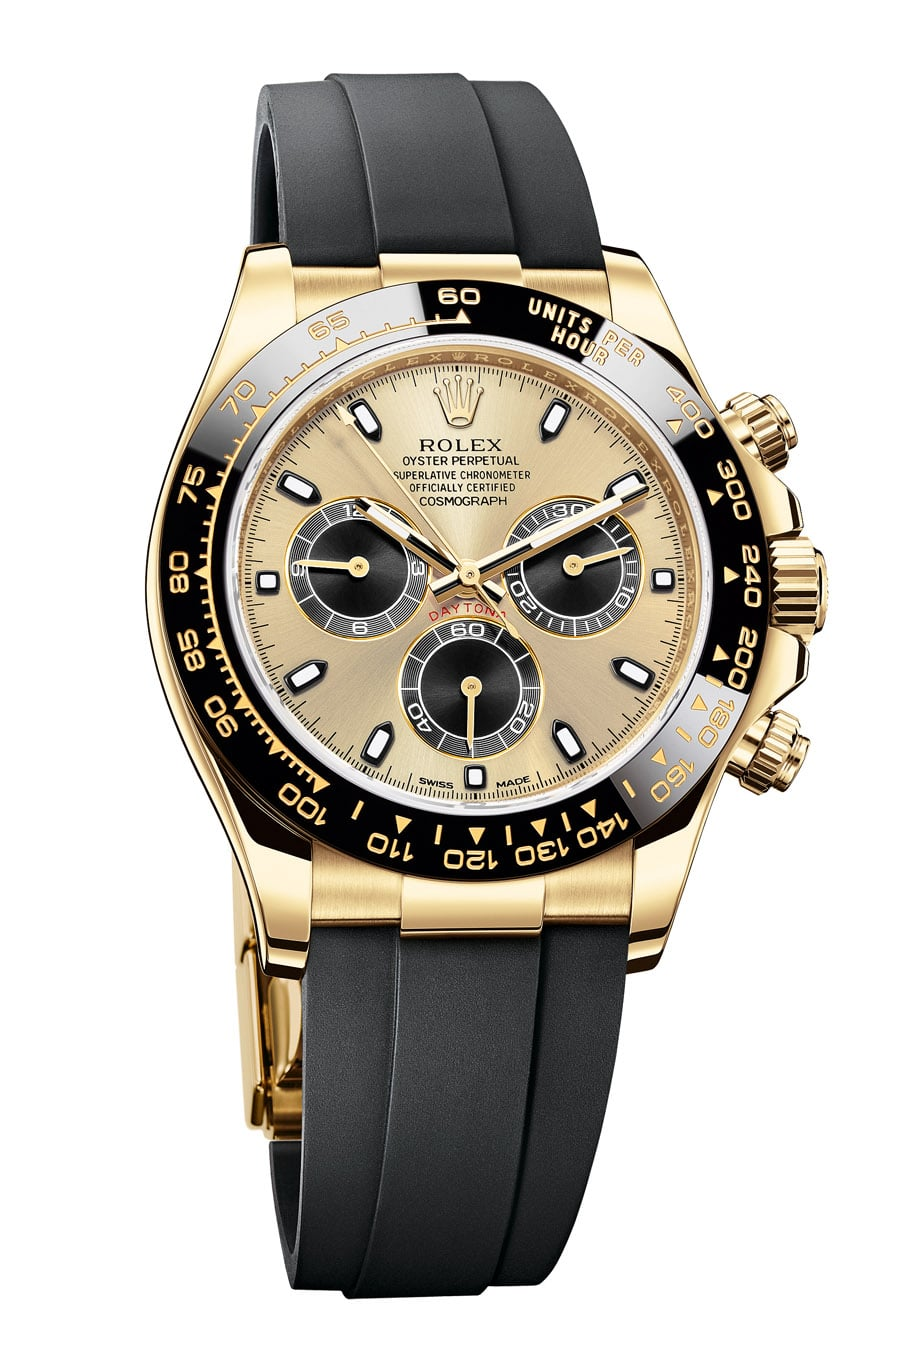 Rolex Cosmograph Daytona, Referenz 116518LN